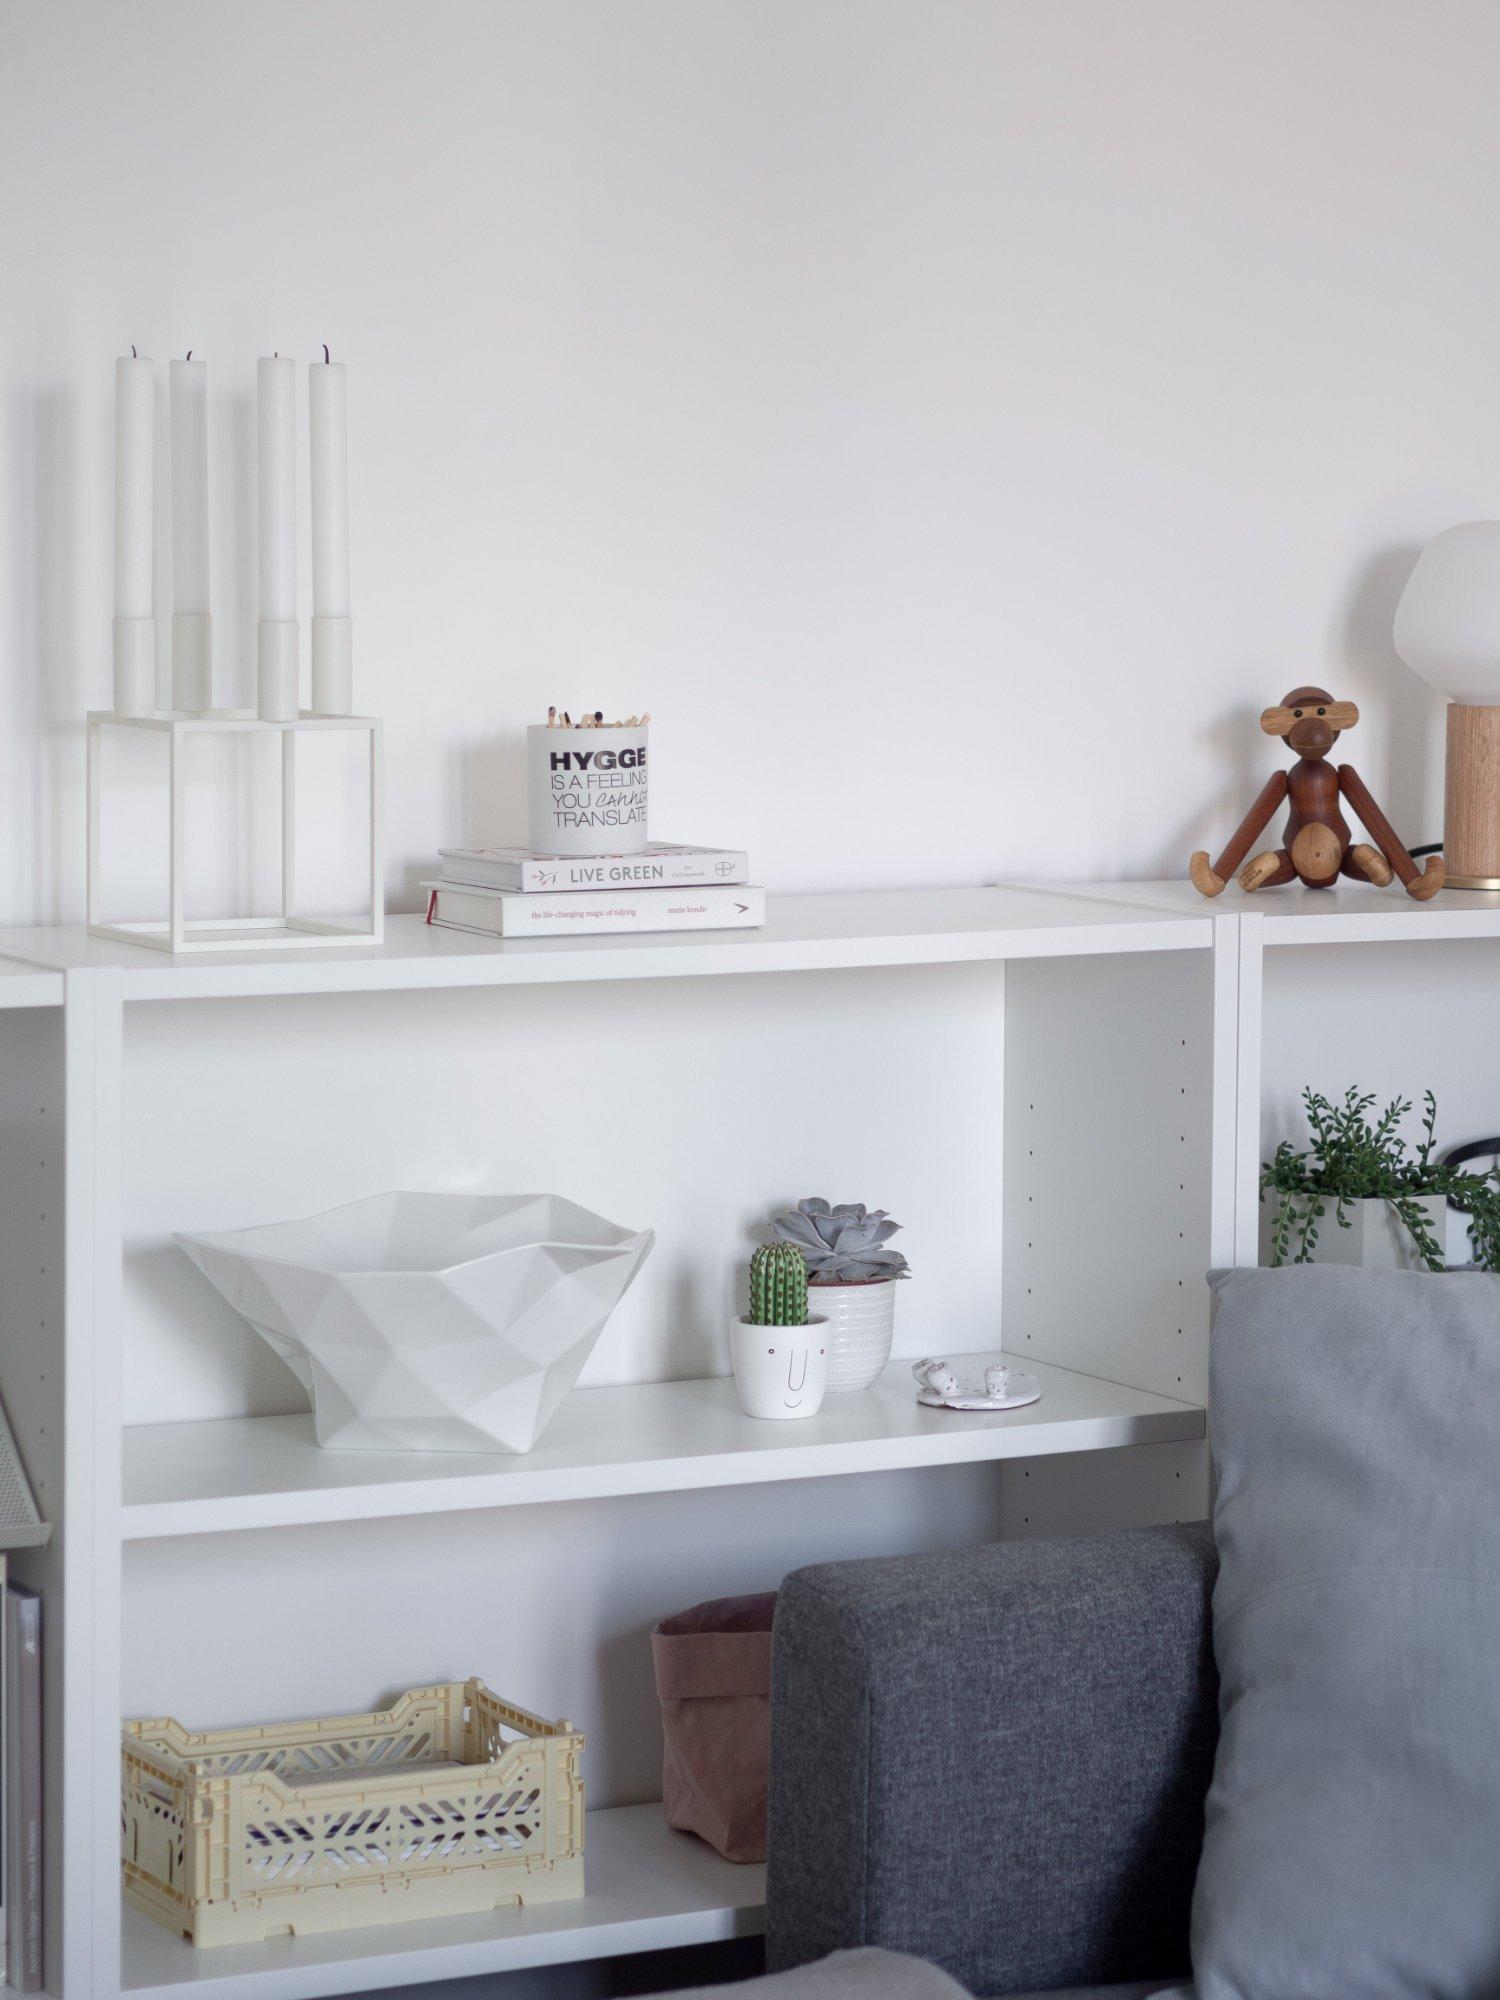 That Scandinavian Feeling Home Tour livingroom shelf decor